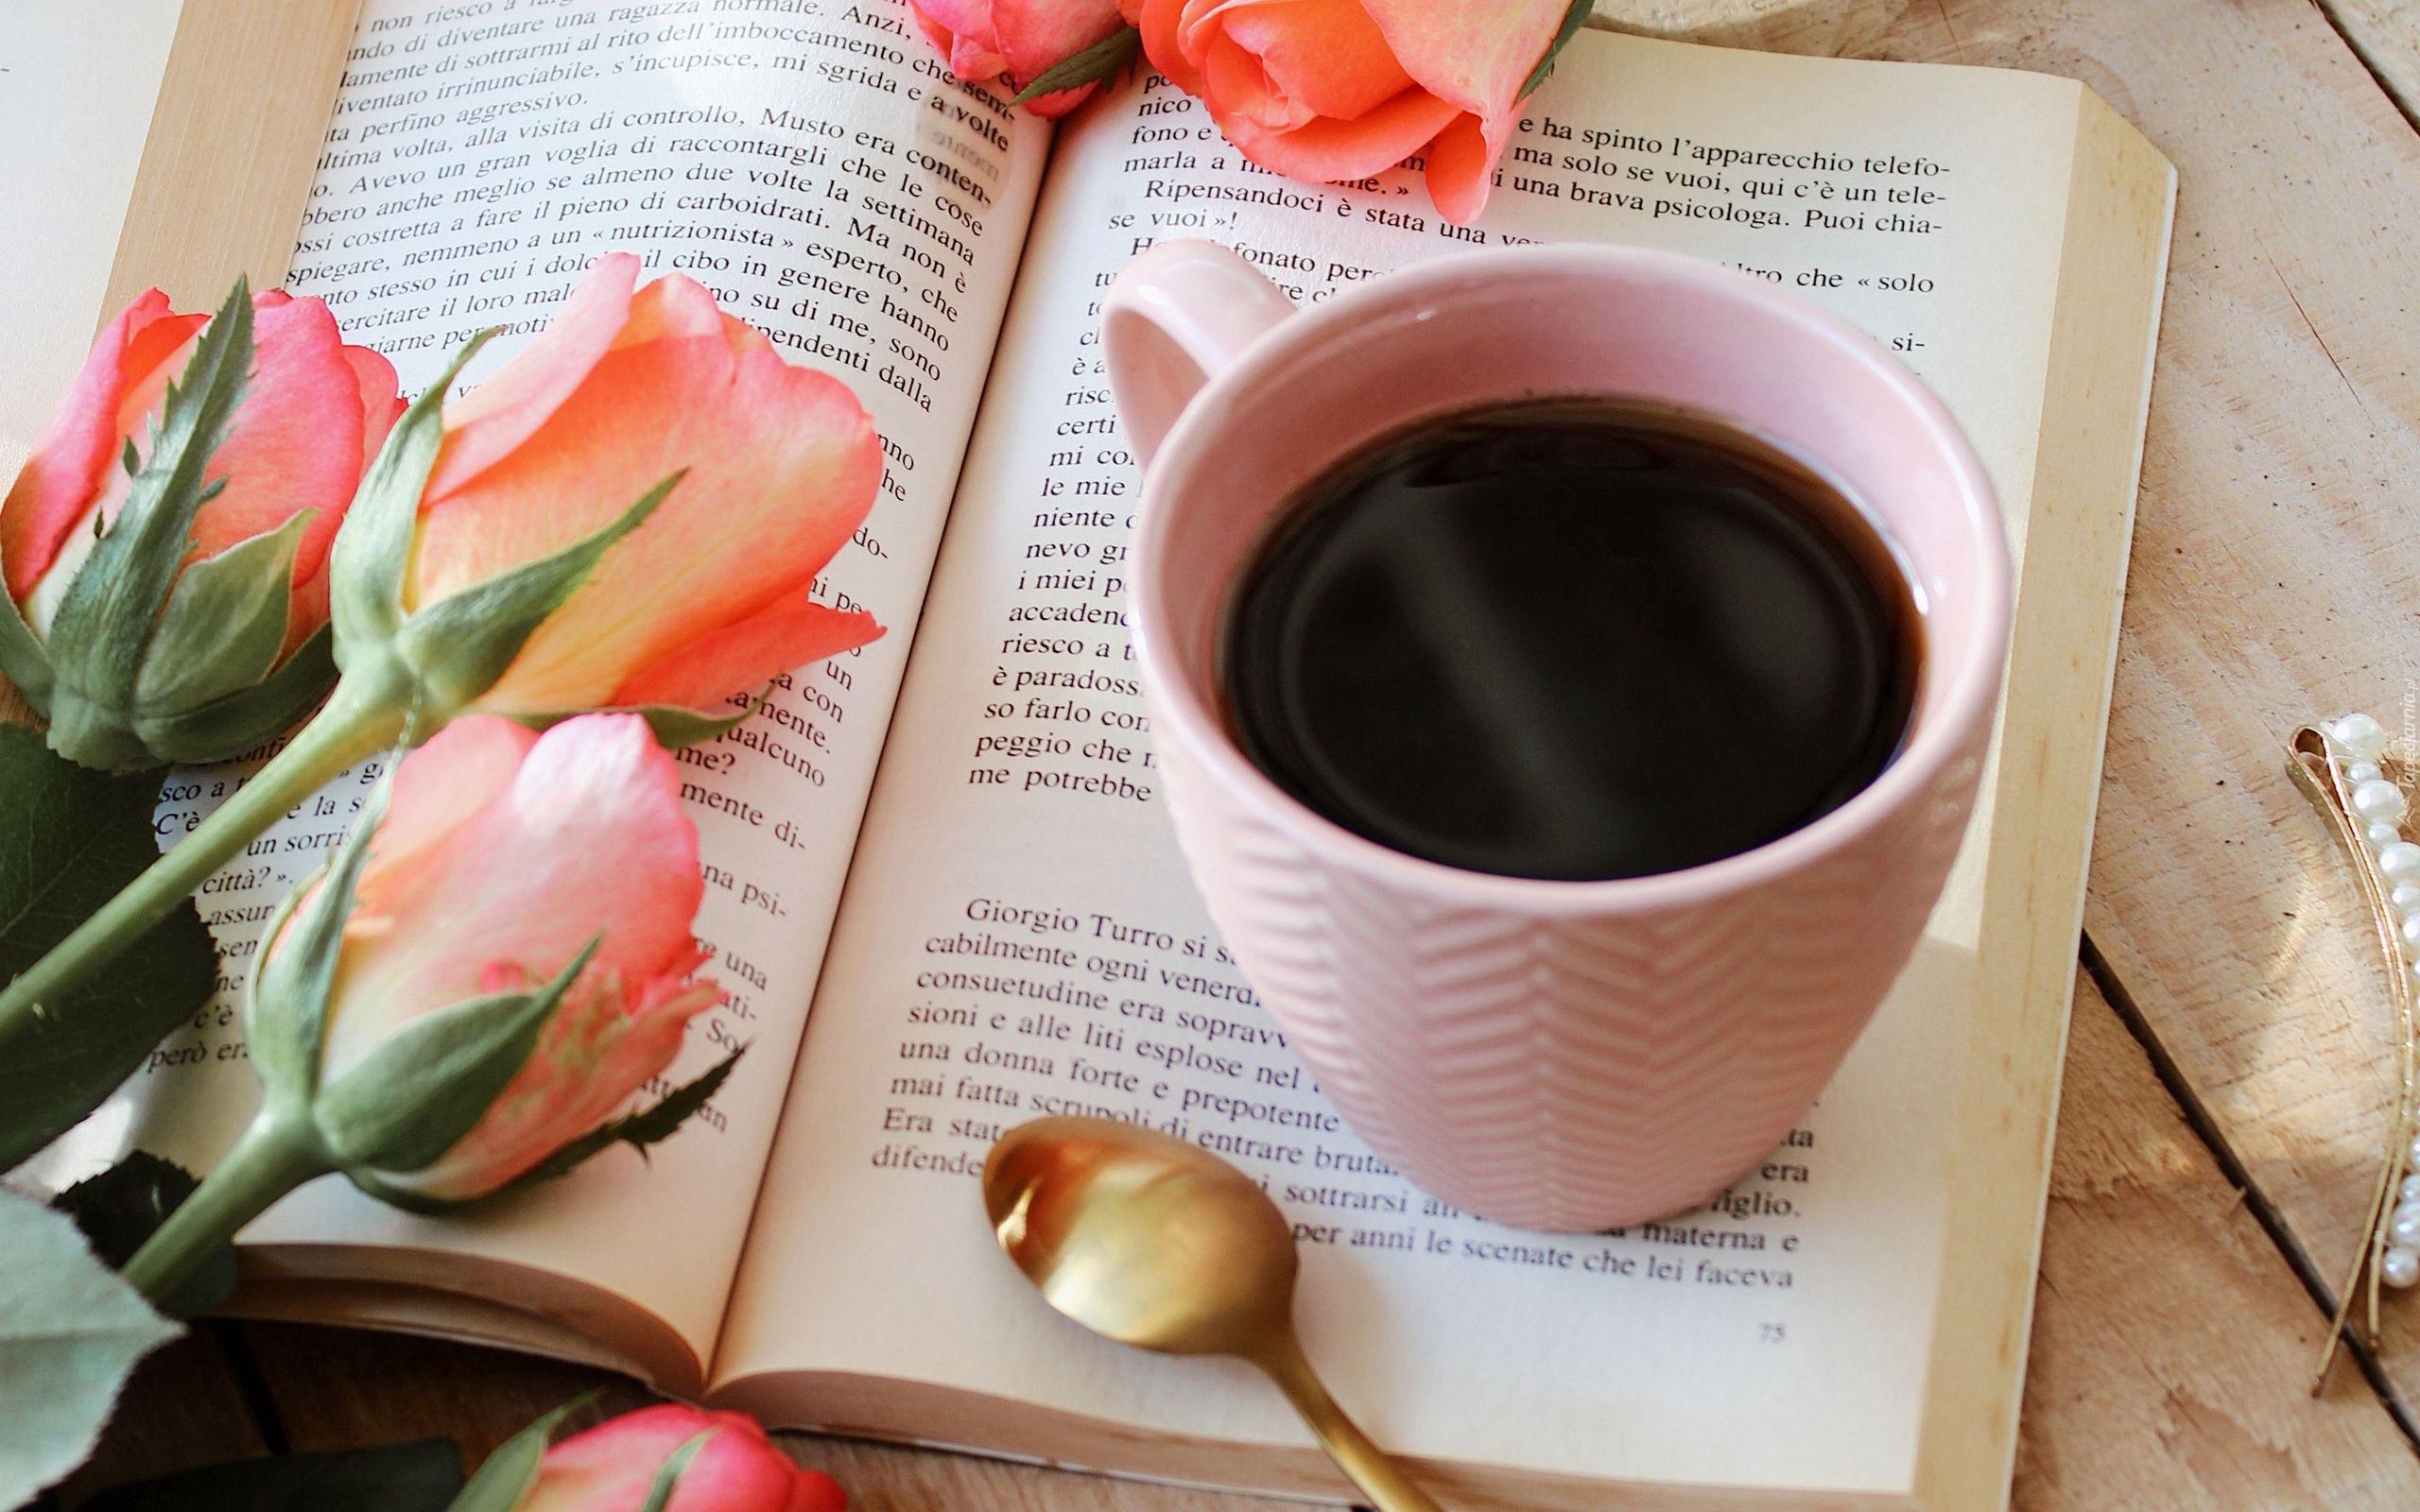 tapeta-kubek-kawy-na-otwartej-ksiazce-obok-roz.jpg